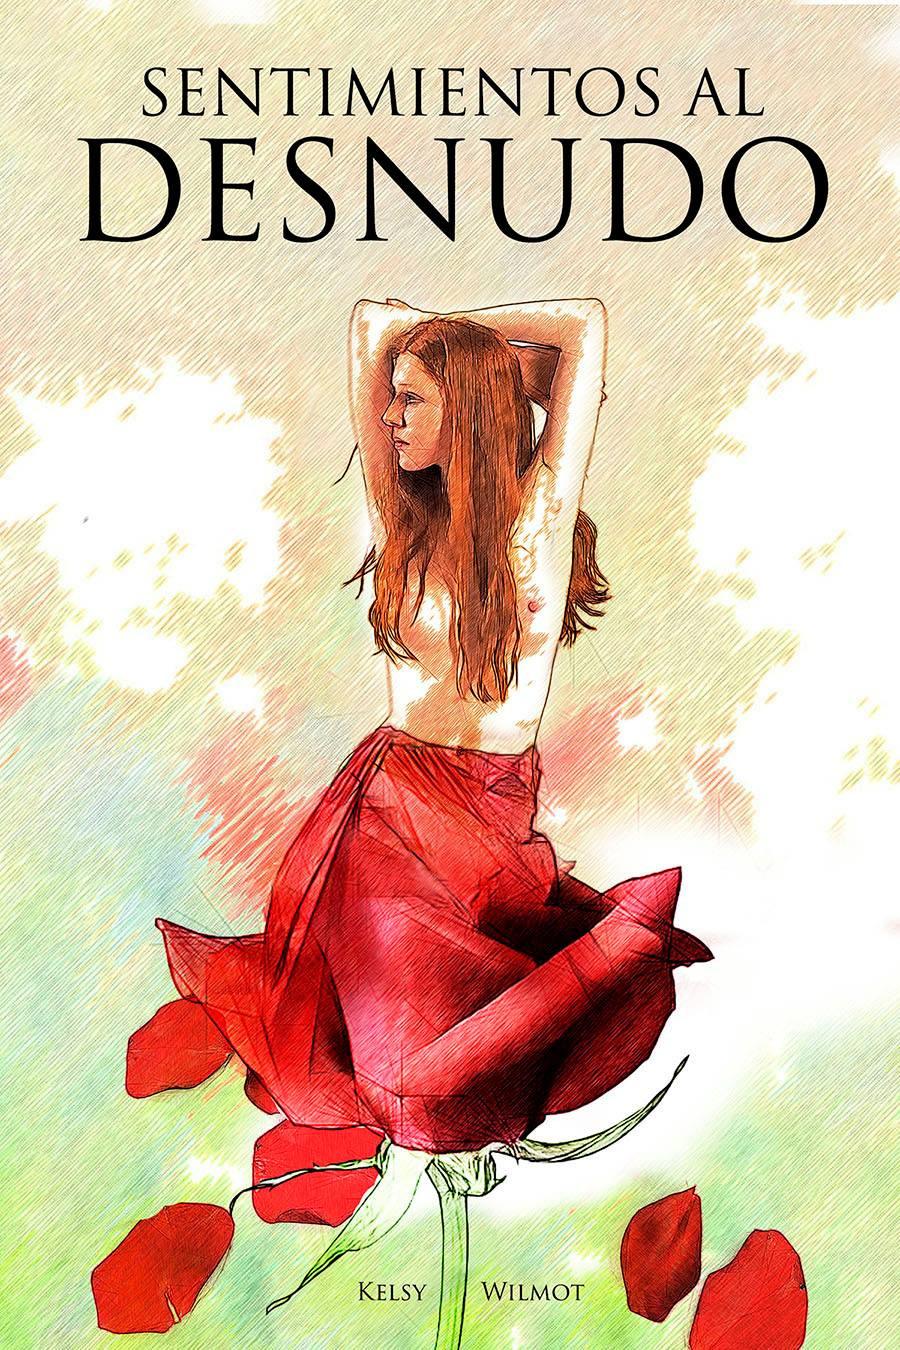 Poesía,desnudos,alma,Kelsy Wilmont